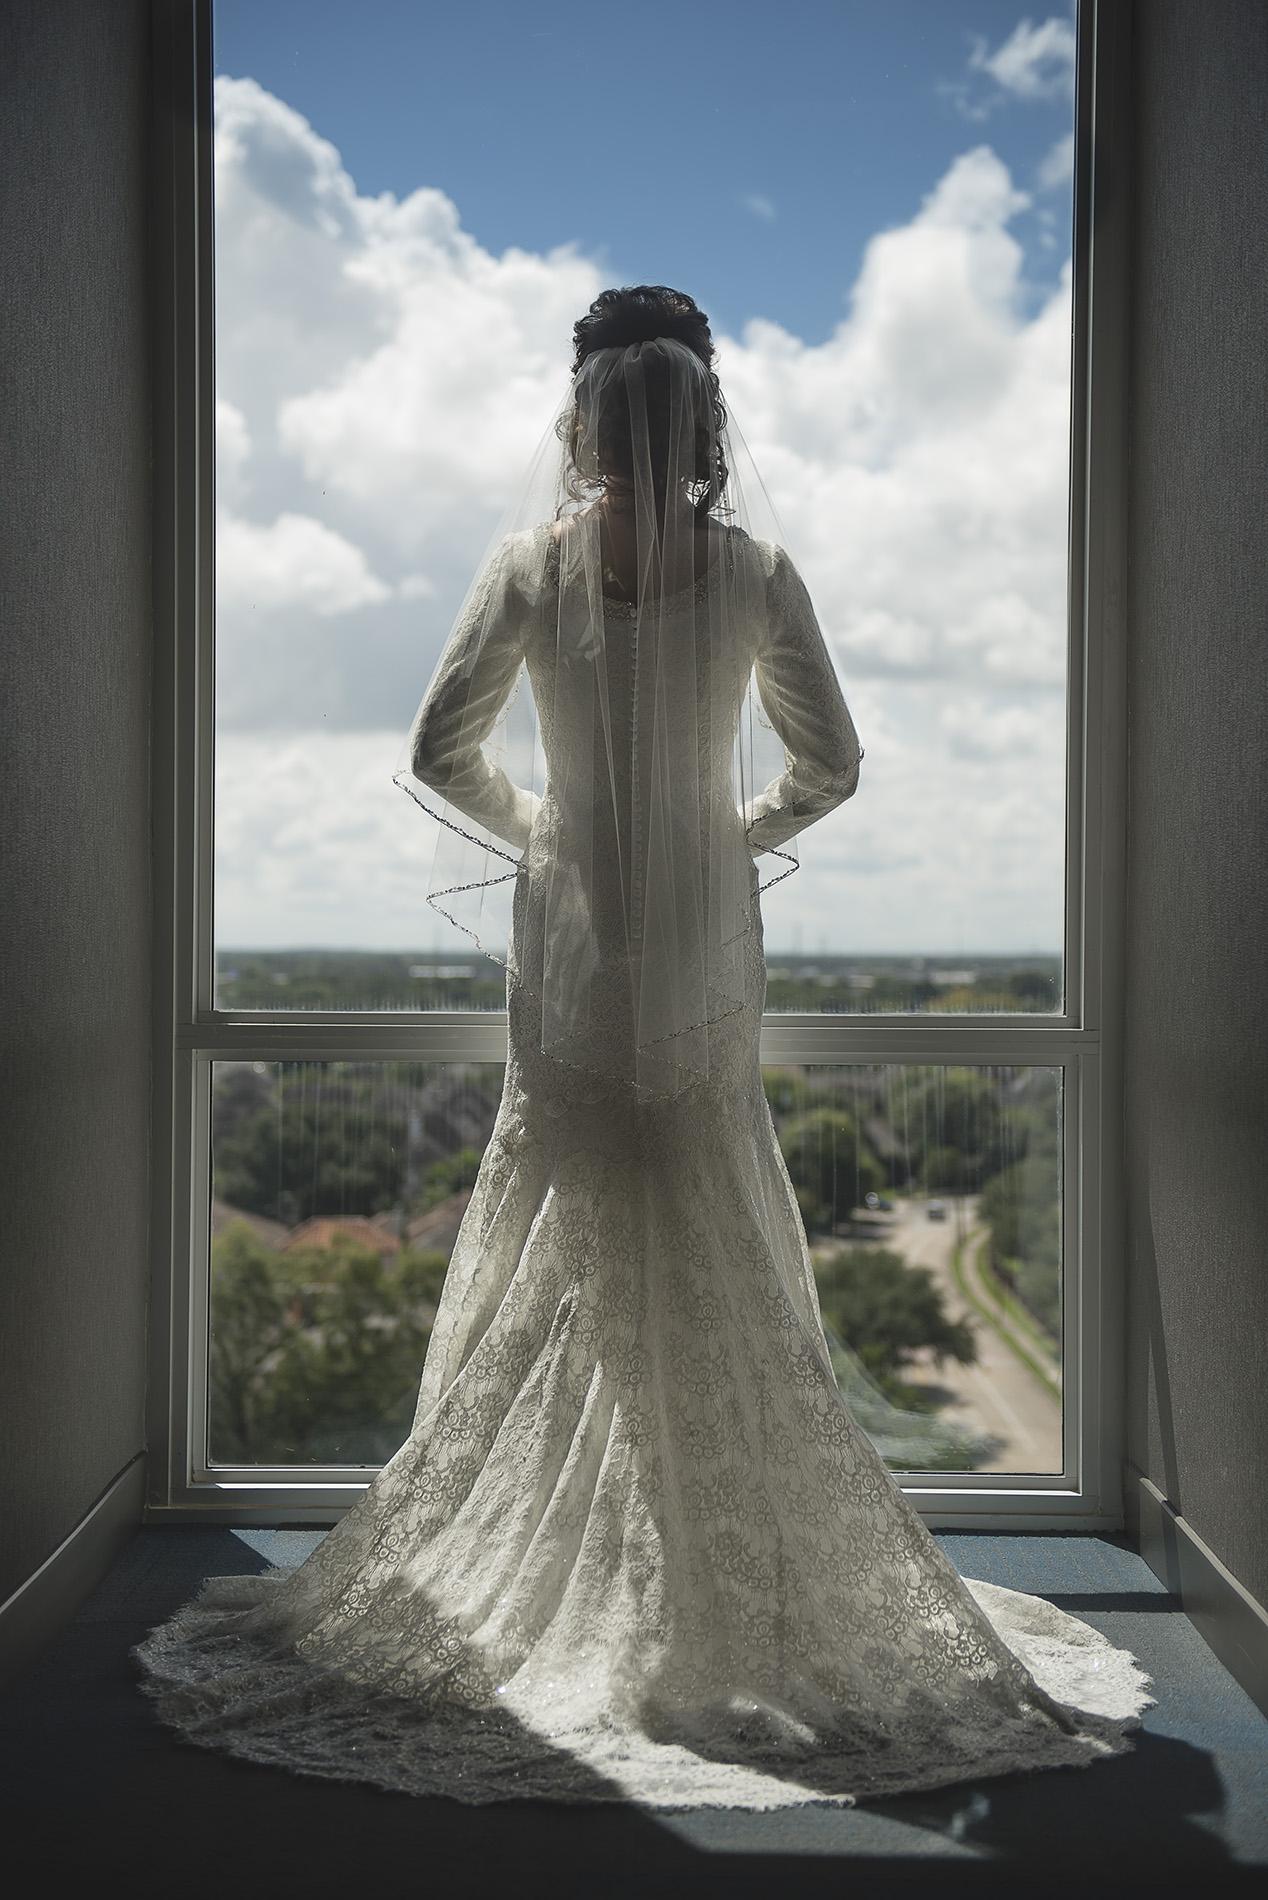 Aloft-hotel-houston-texas-bridal-wedding-photography